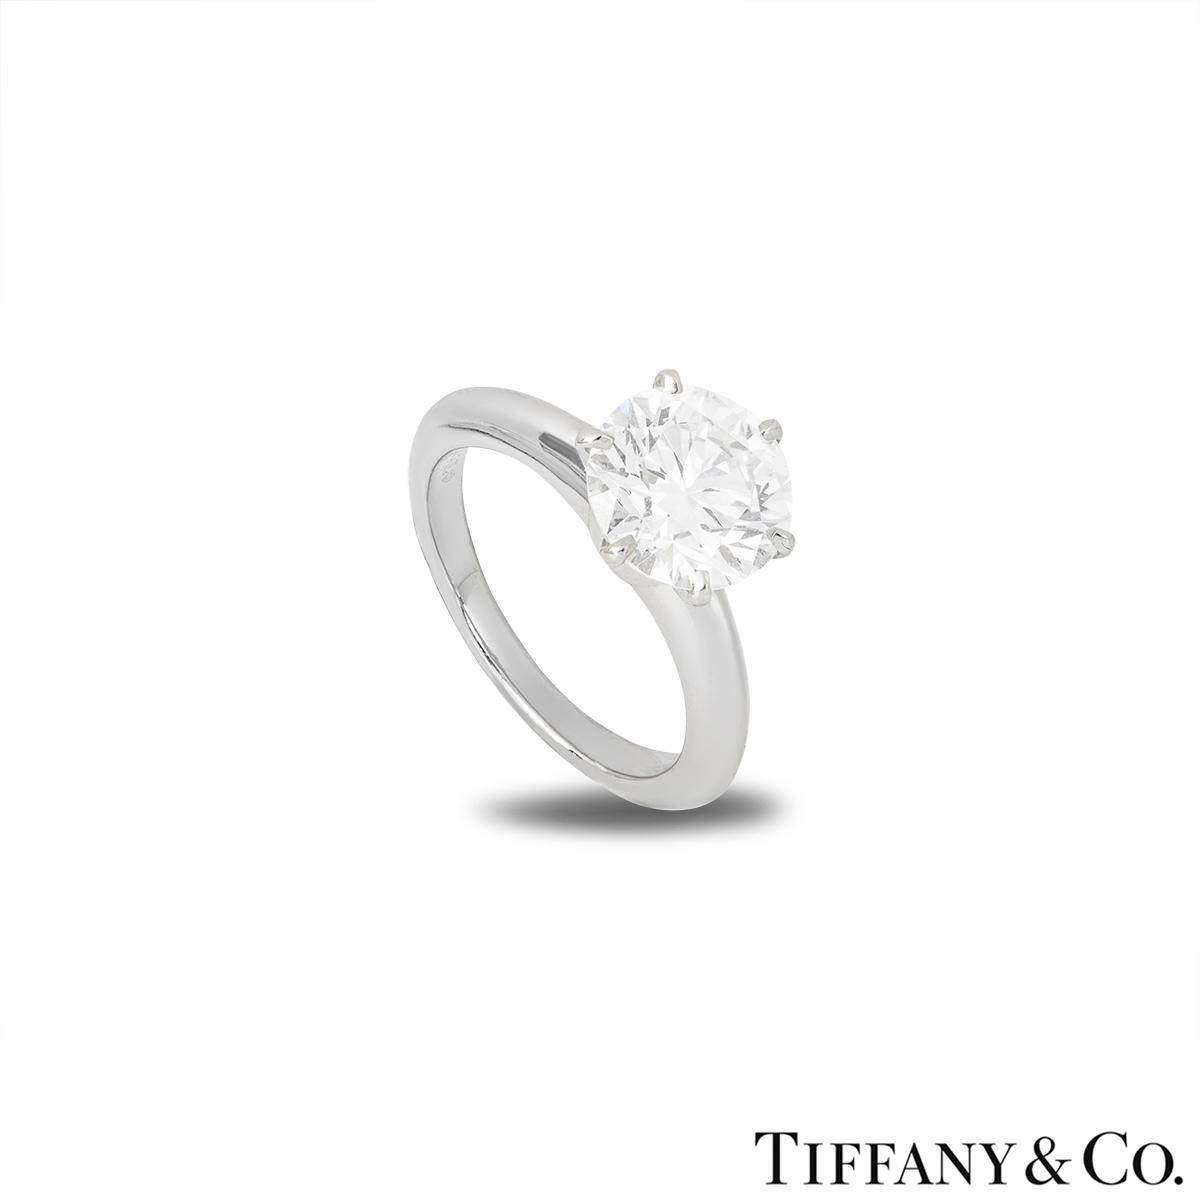 Tiffany & Co. Platinum Diamond Setting Ring 2.13ct H/VVS1 XXX